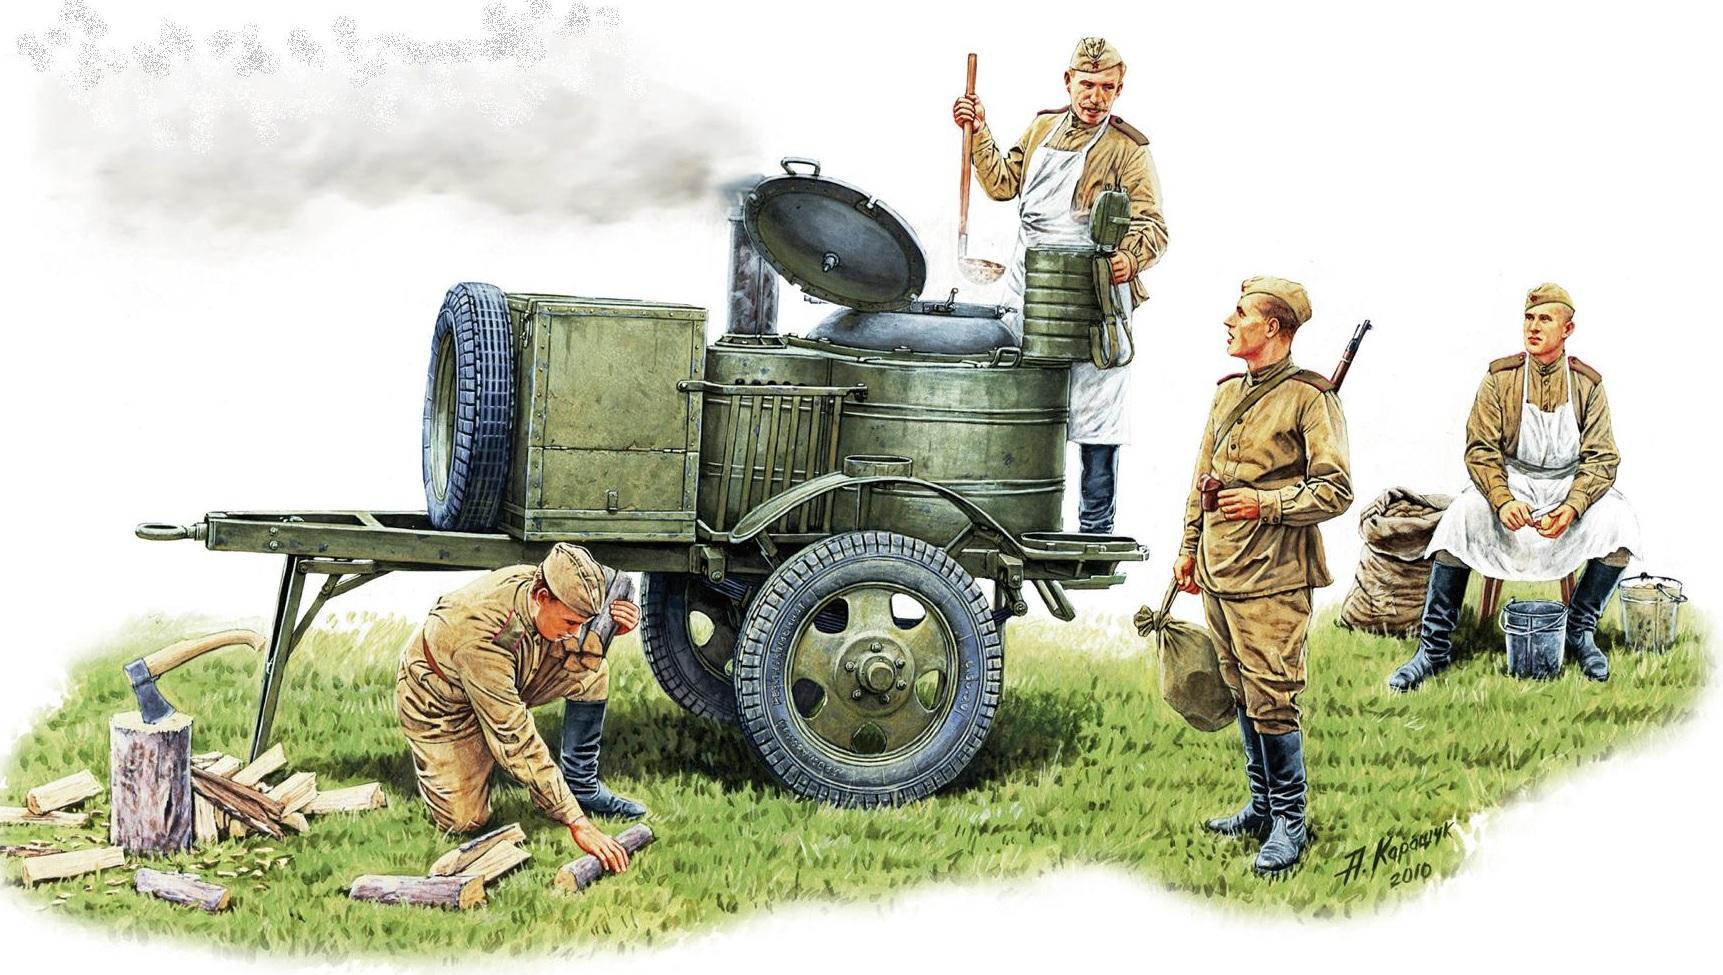 http://www.uniformis.estranky.sk/img/original/263/2-szovjet-gulyas-agyu-1.jpg